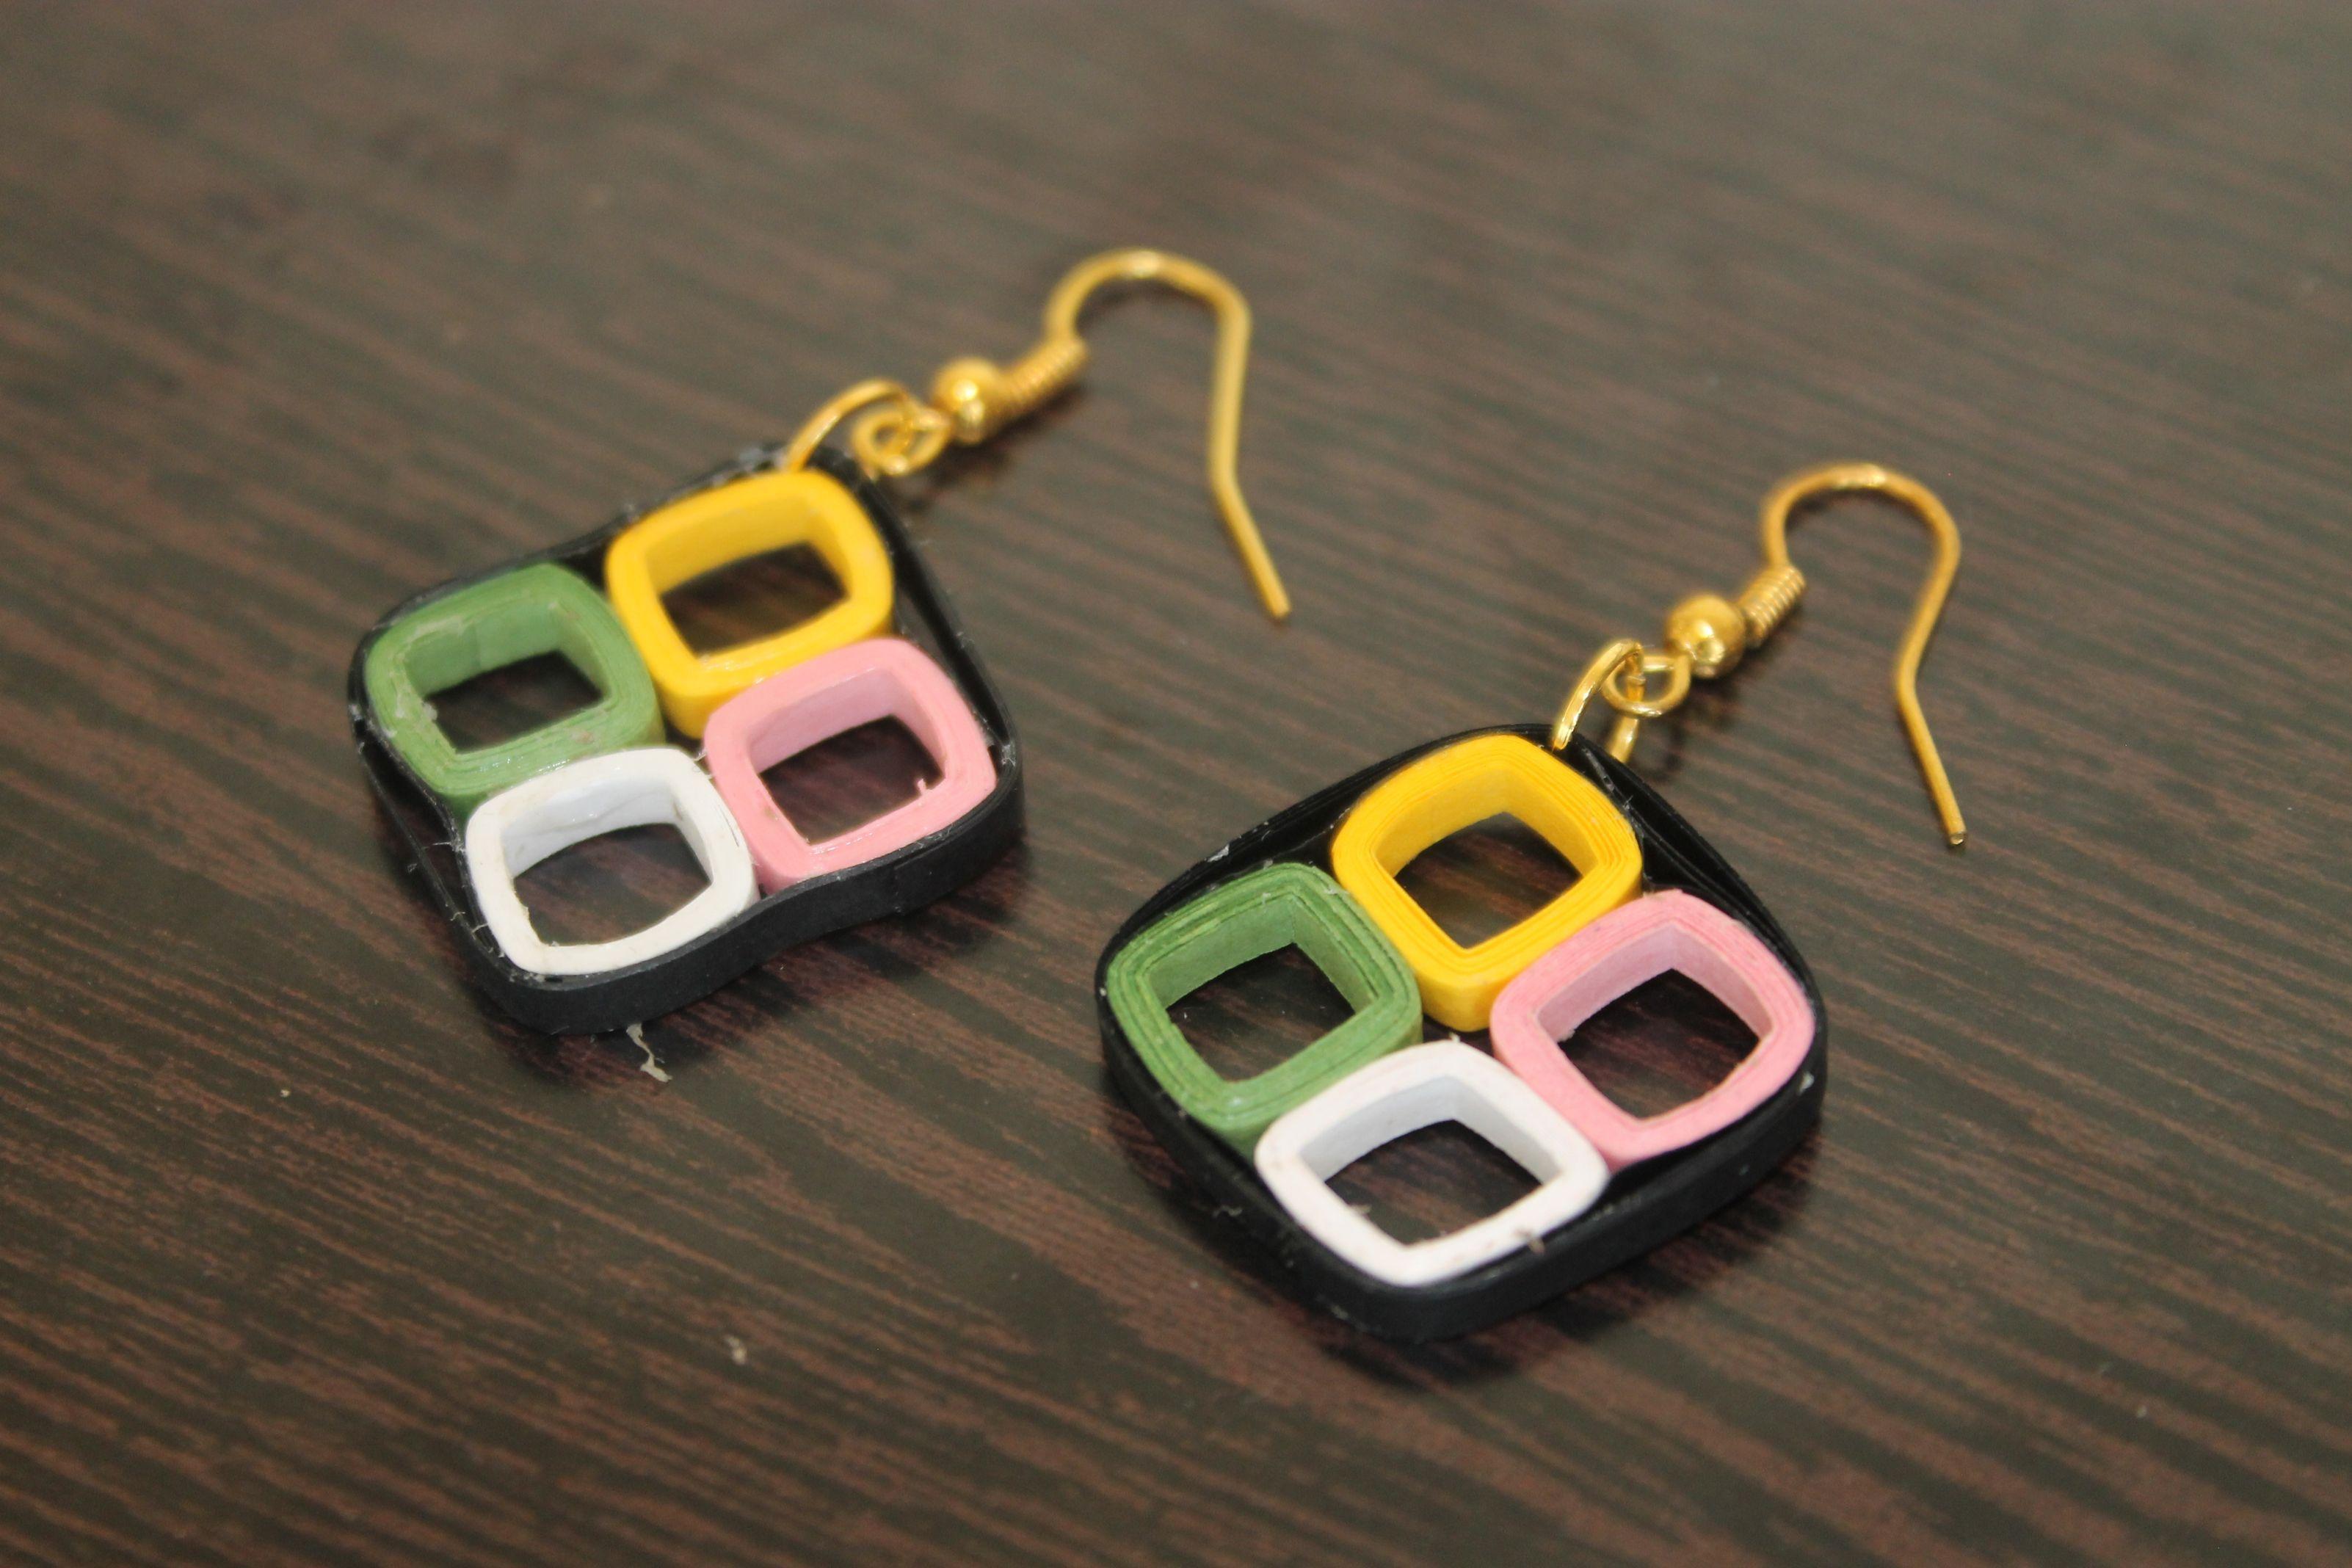 How To Make Handmade Easy Quilled Earings Diy Earring Making Ideas In 2020 How To Make Earrings Quilled Jewellery Handmade Jewelry